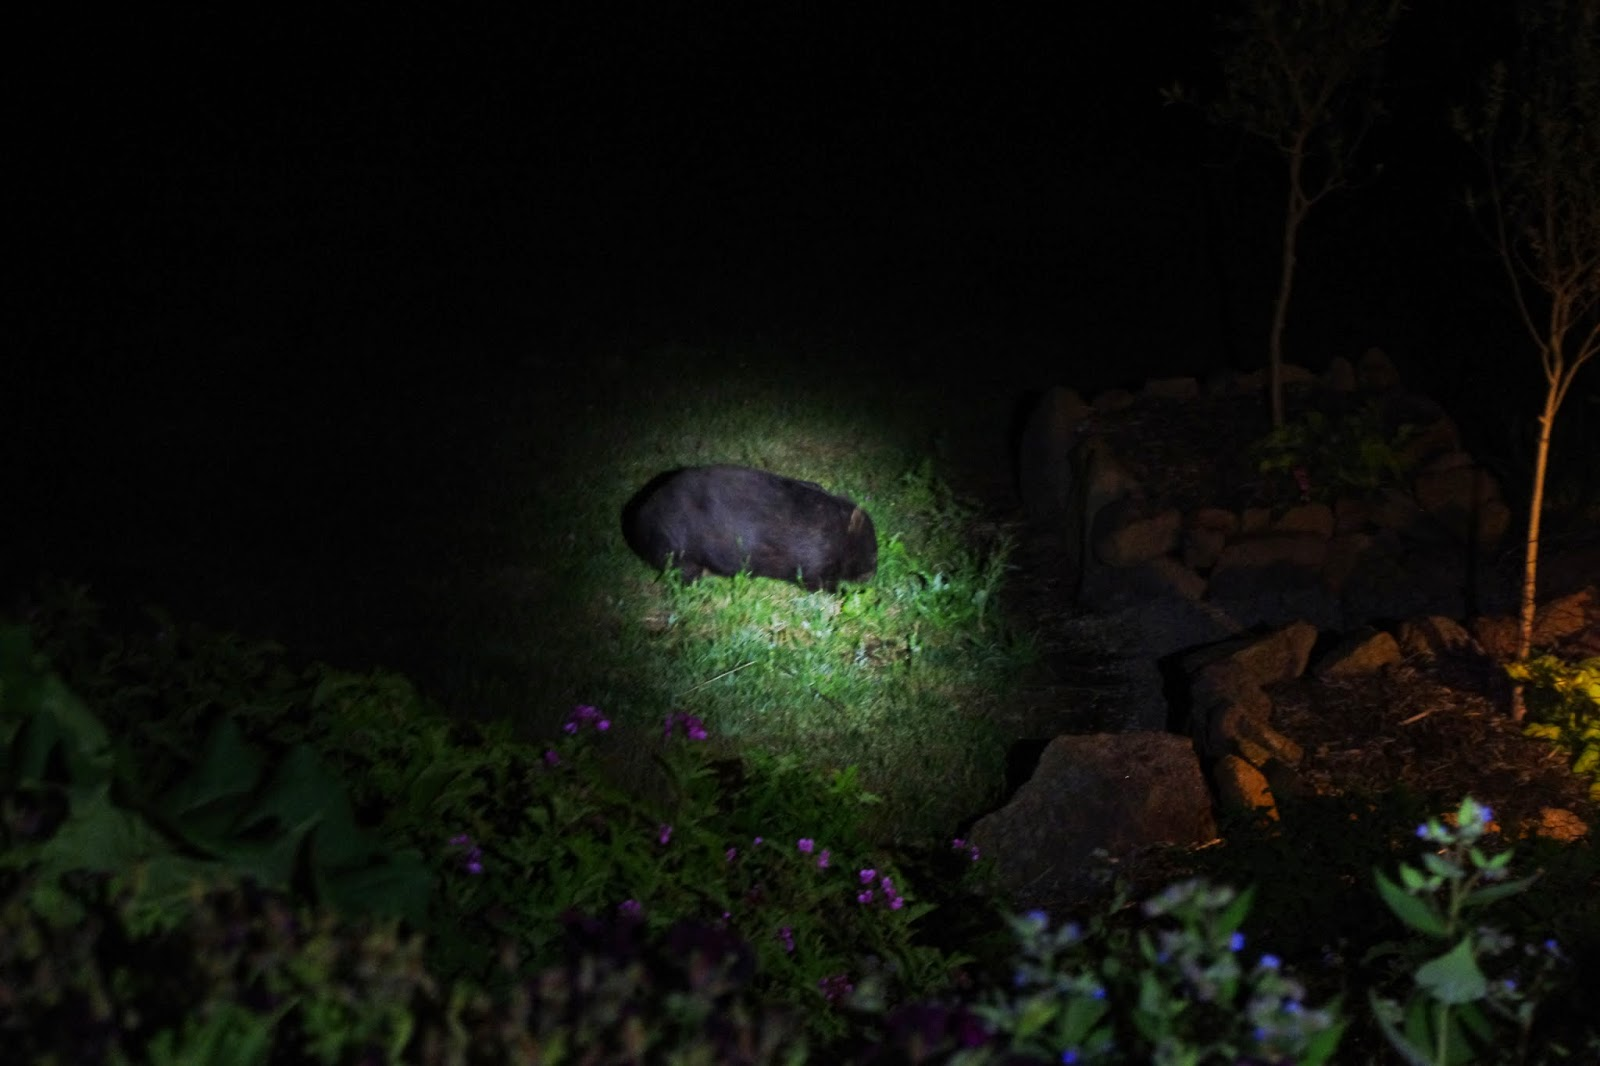 Fatso the wombat cruising the herbage